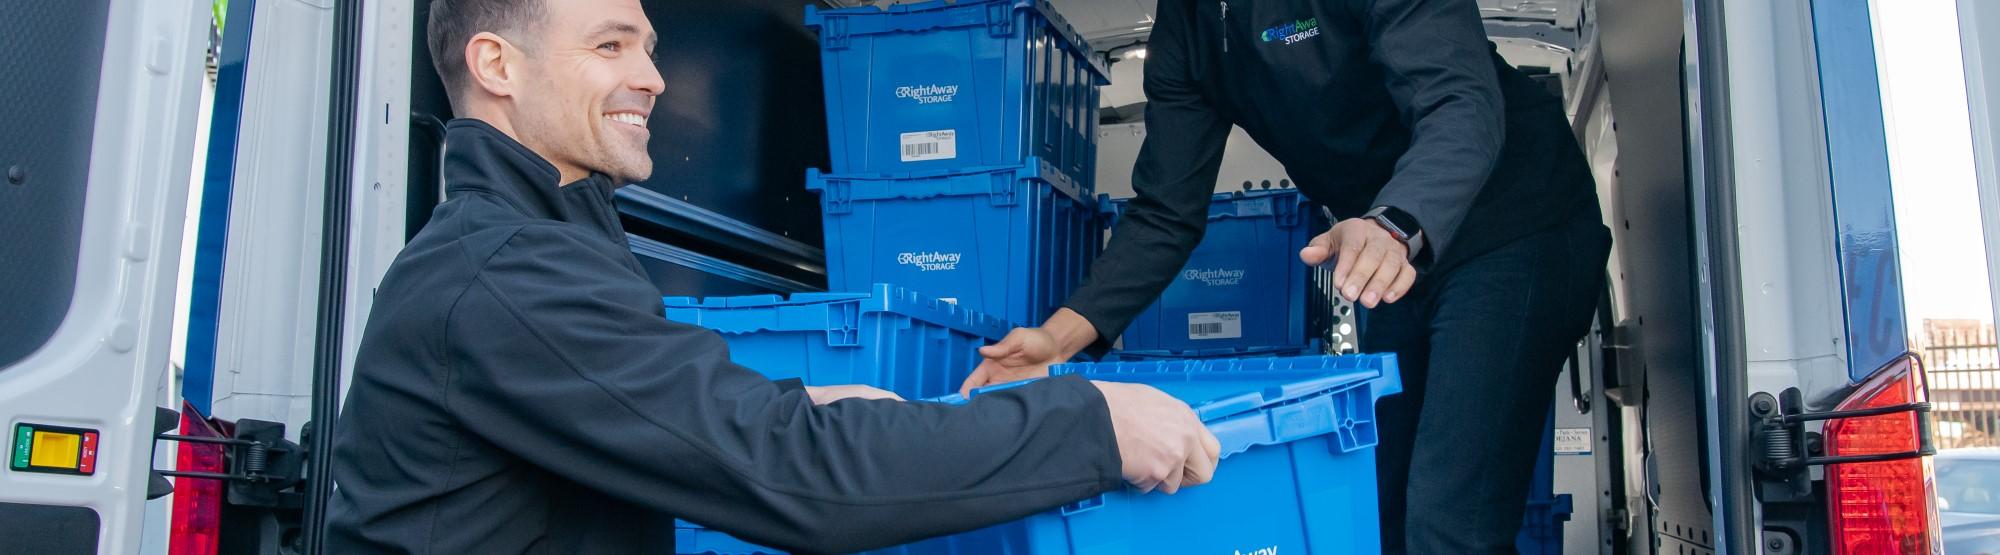 On Demand Storage Delivery